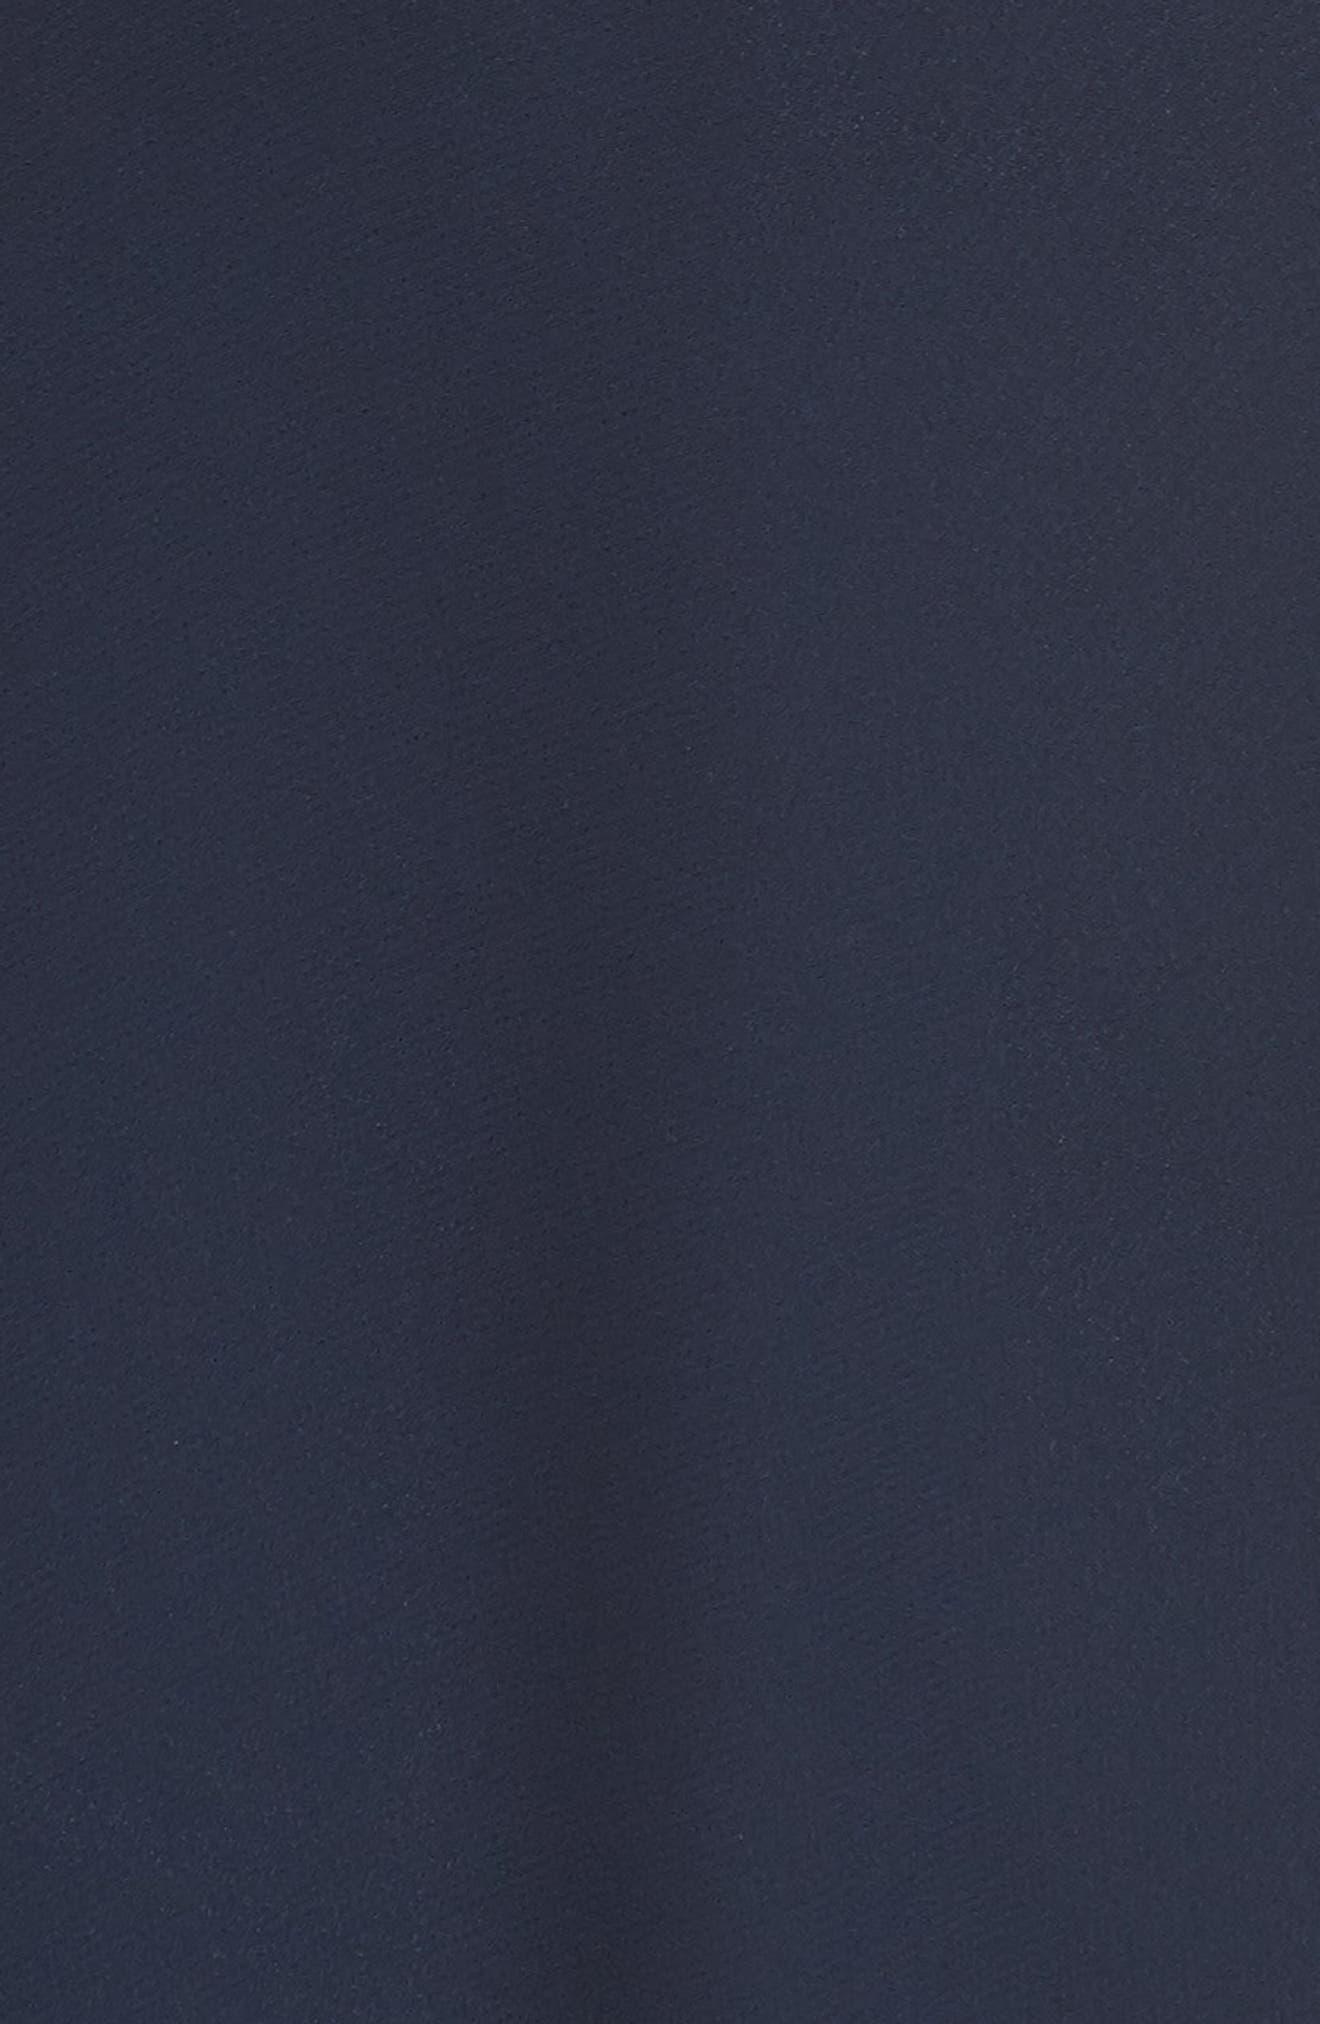 Kiara Bow Back Chiffon Evening Dress,                             Alternate thumbnail 5, color,                             NAVY